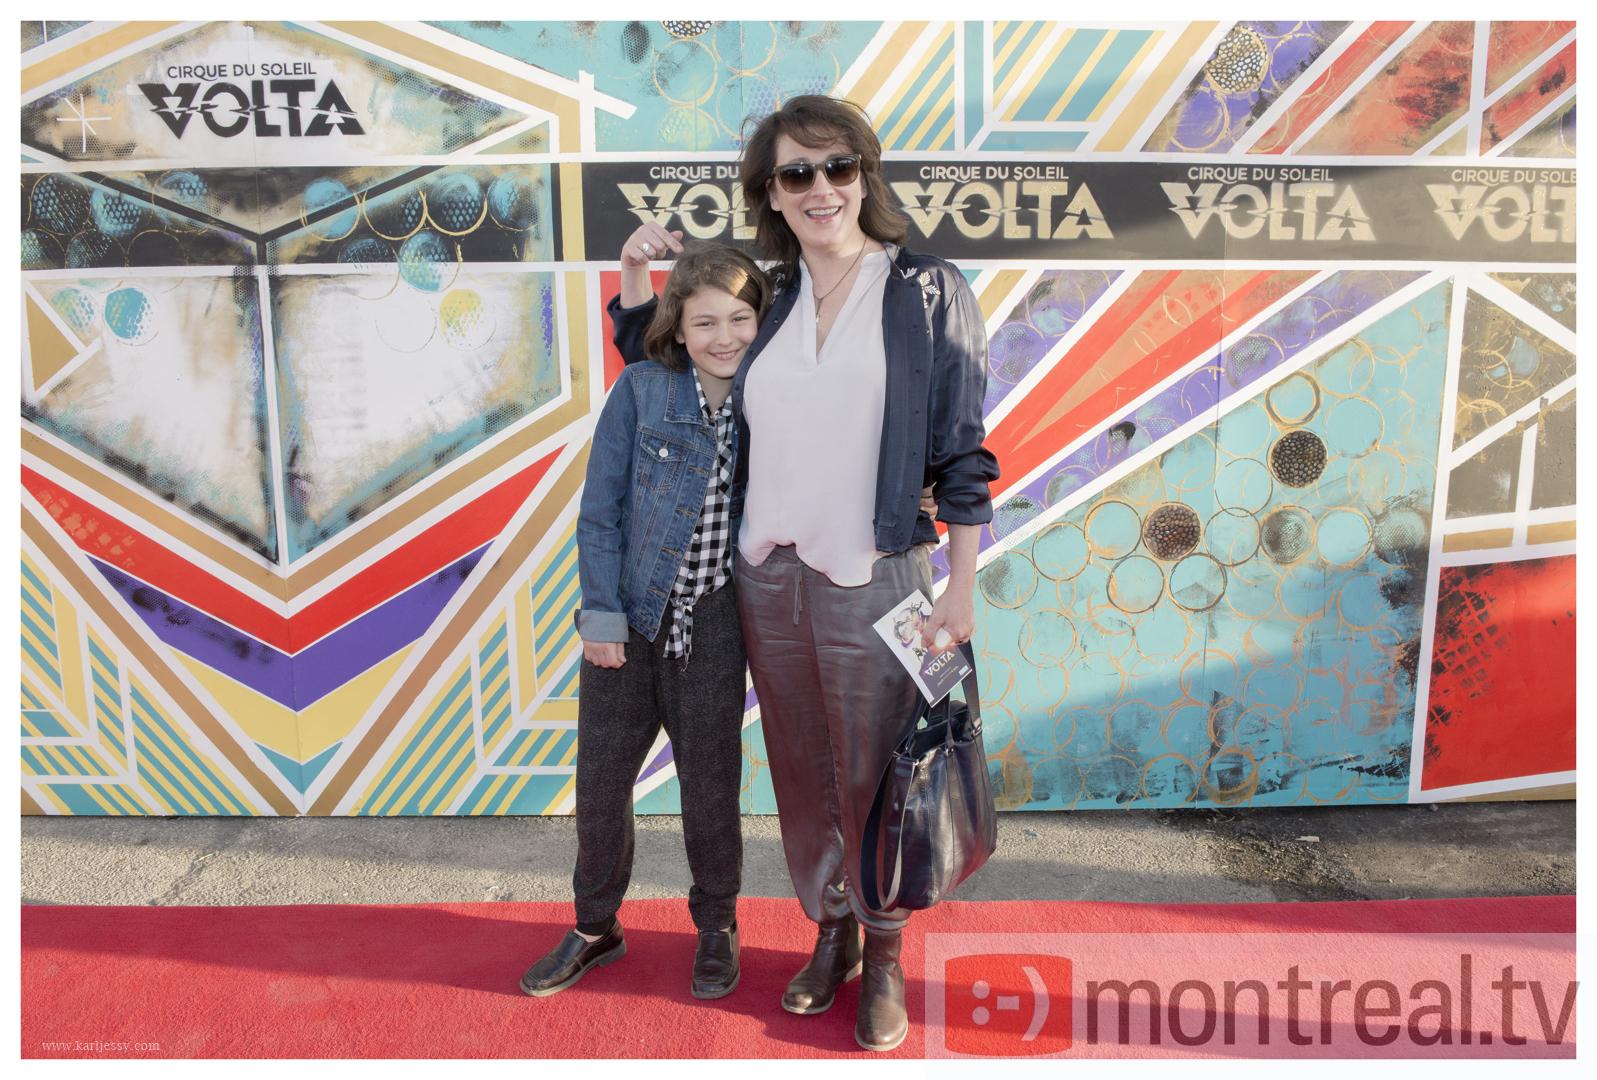 Anick Lemay_VOLTA_RedCarpet_MontrealTV0001